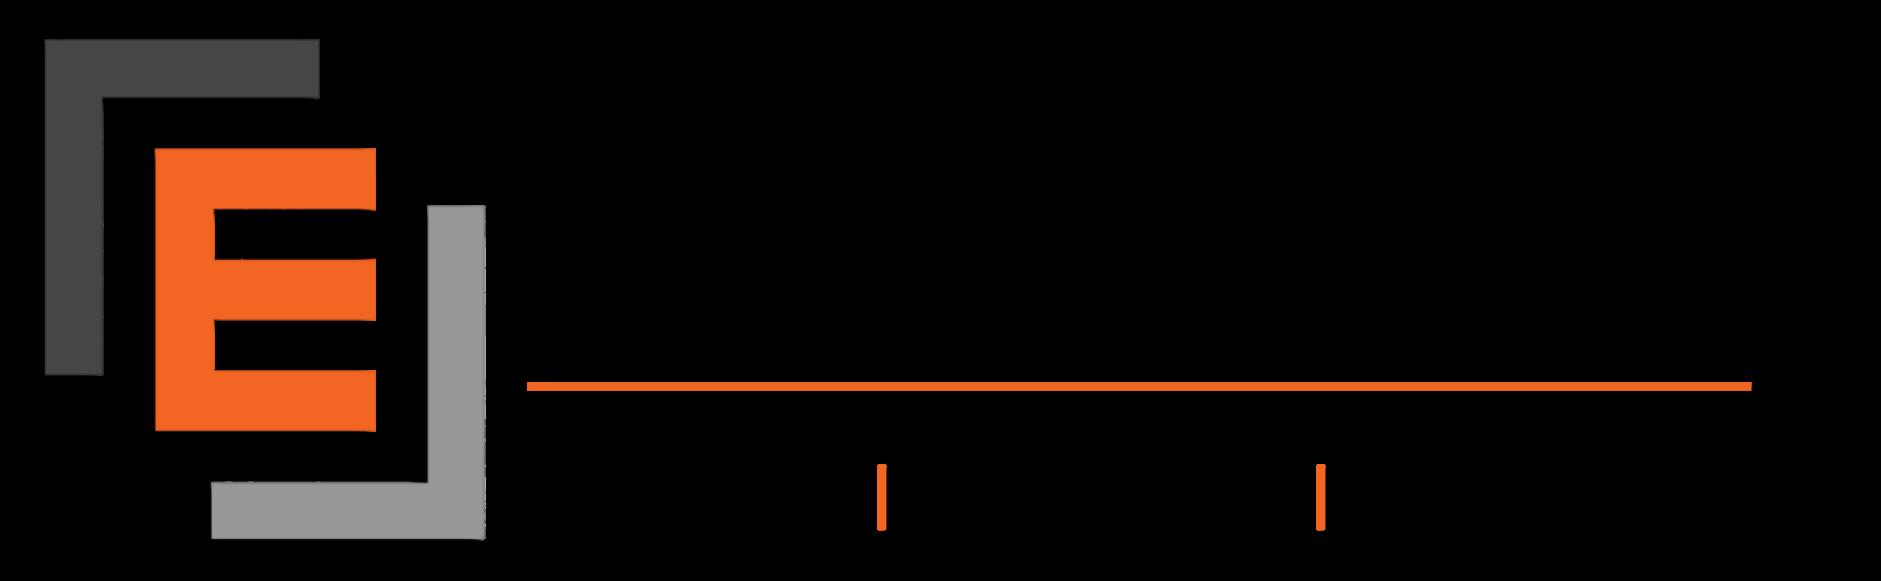 EMCO-logo-Final-061019.png